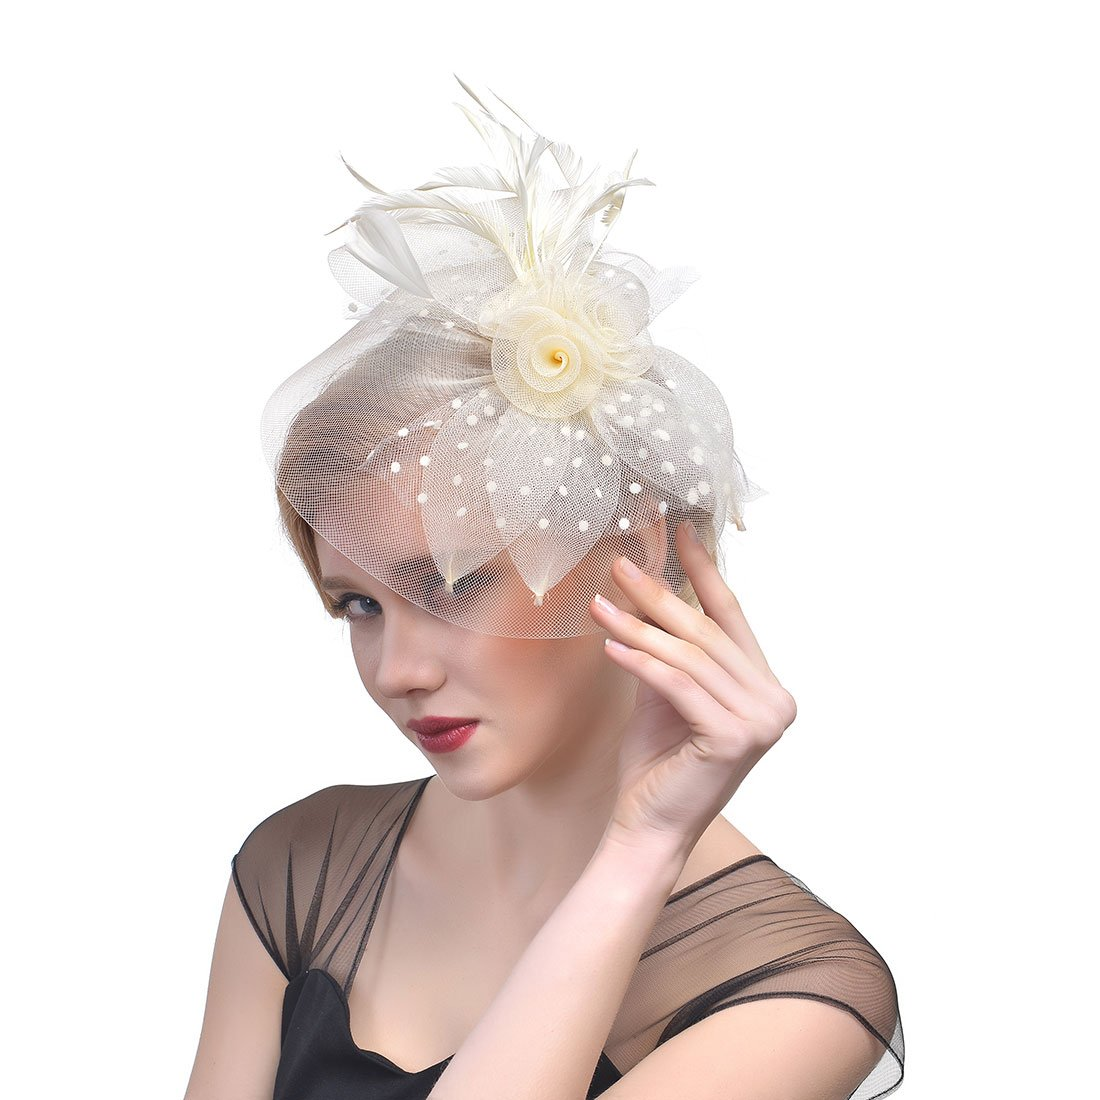 Women's Feather Hat Cocktail Derby Fascinator Headpiece Party Hair Clips (Beige)